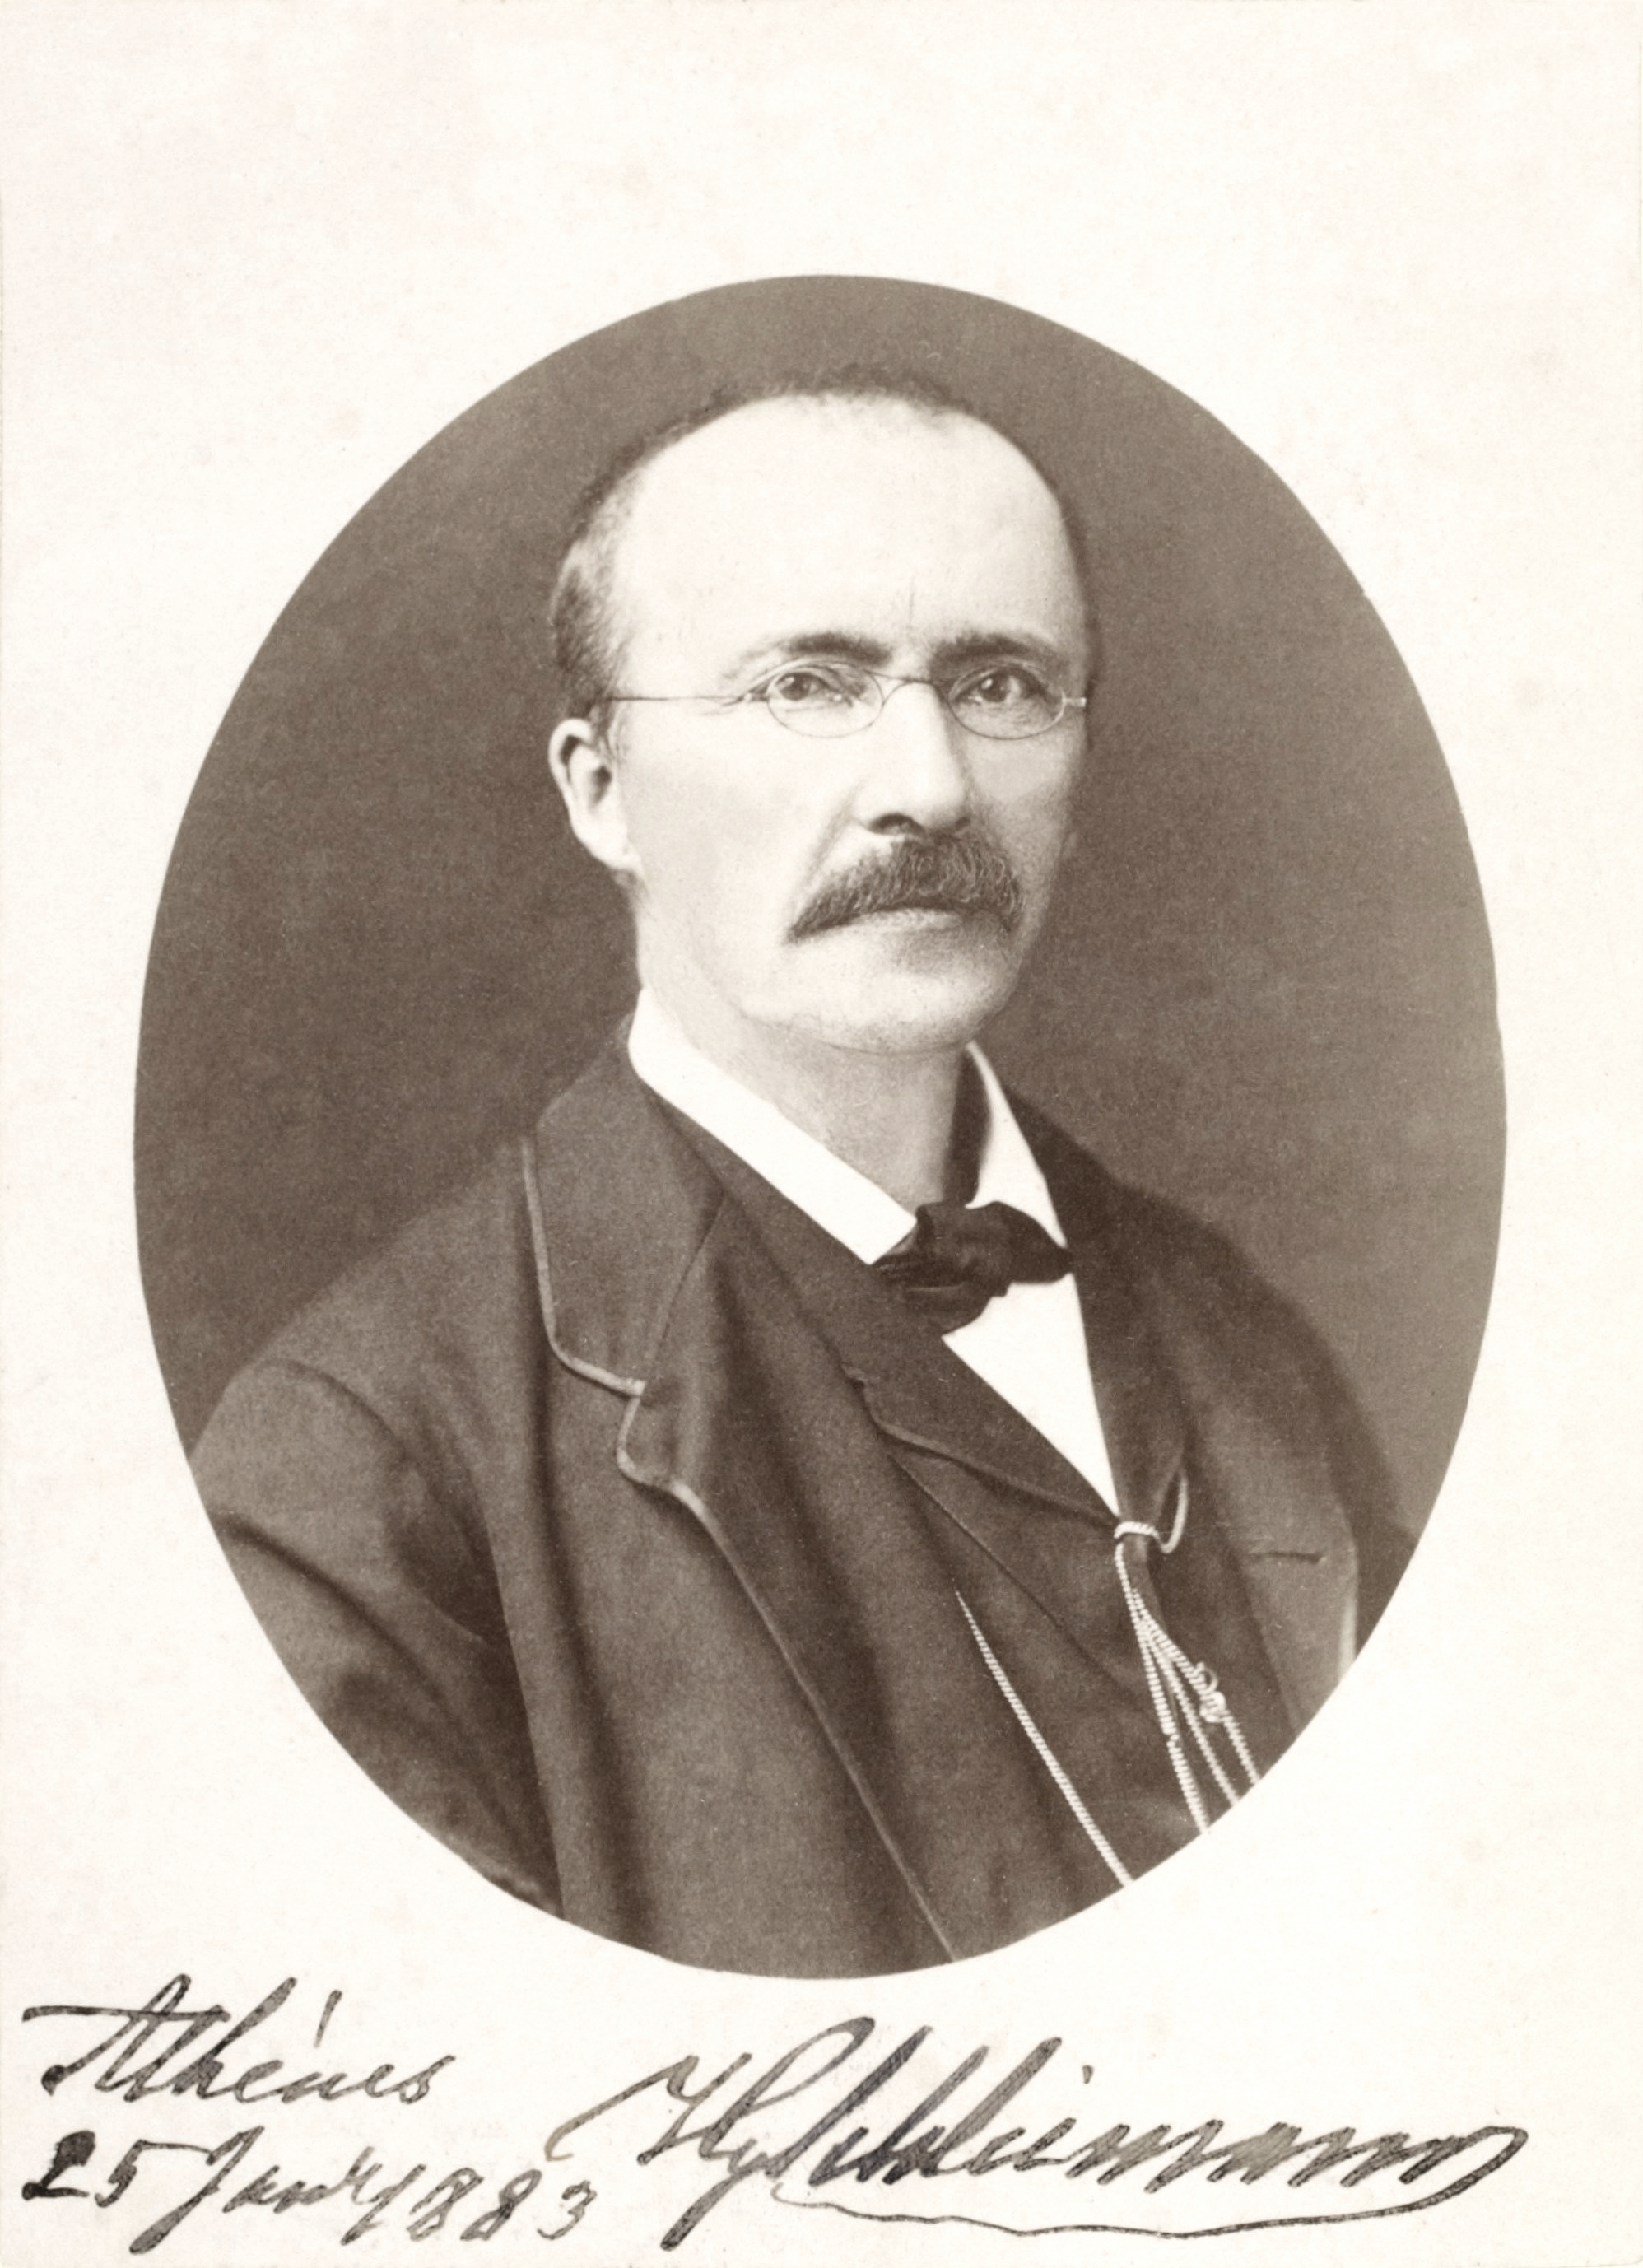 Heinrich Schliemann, the man who discovered Troy